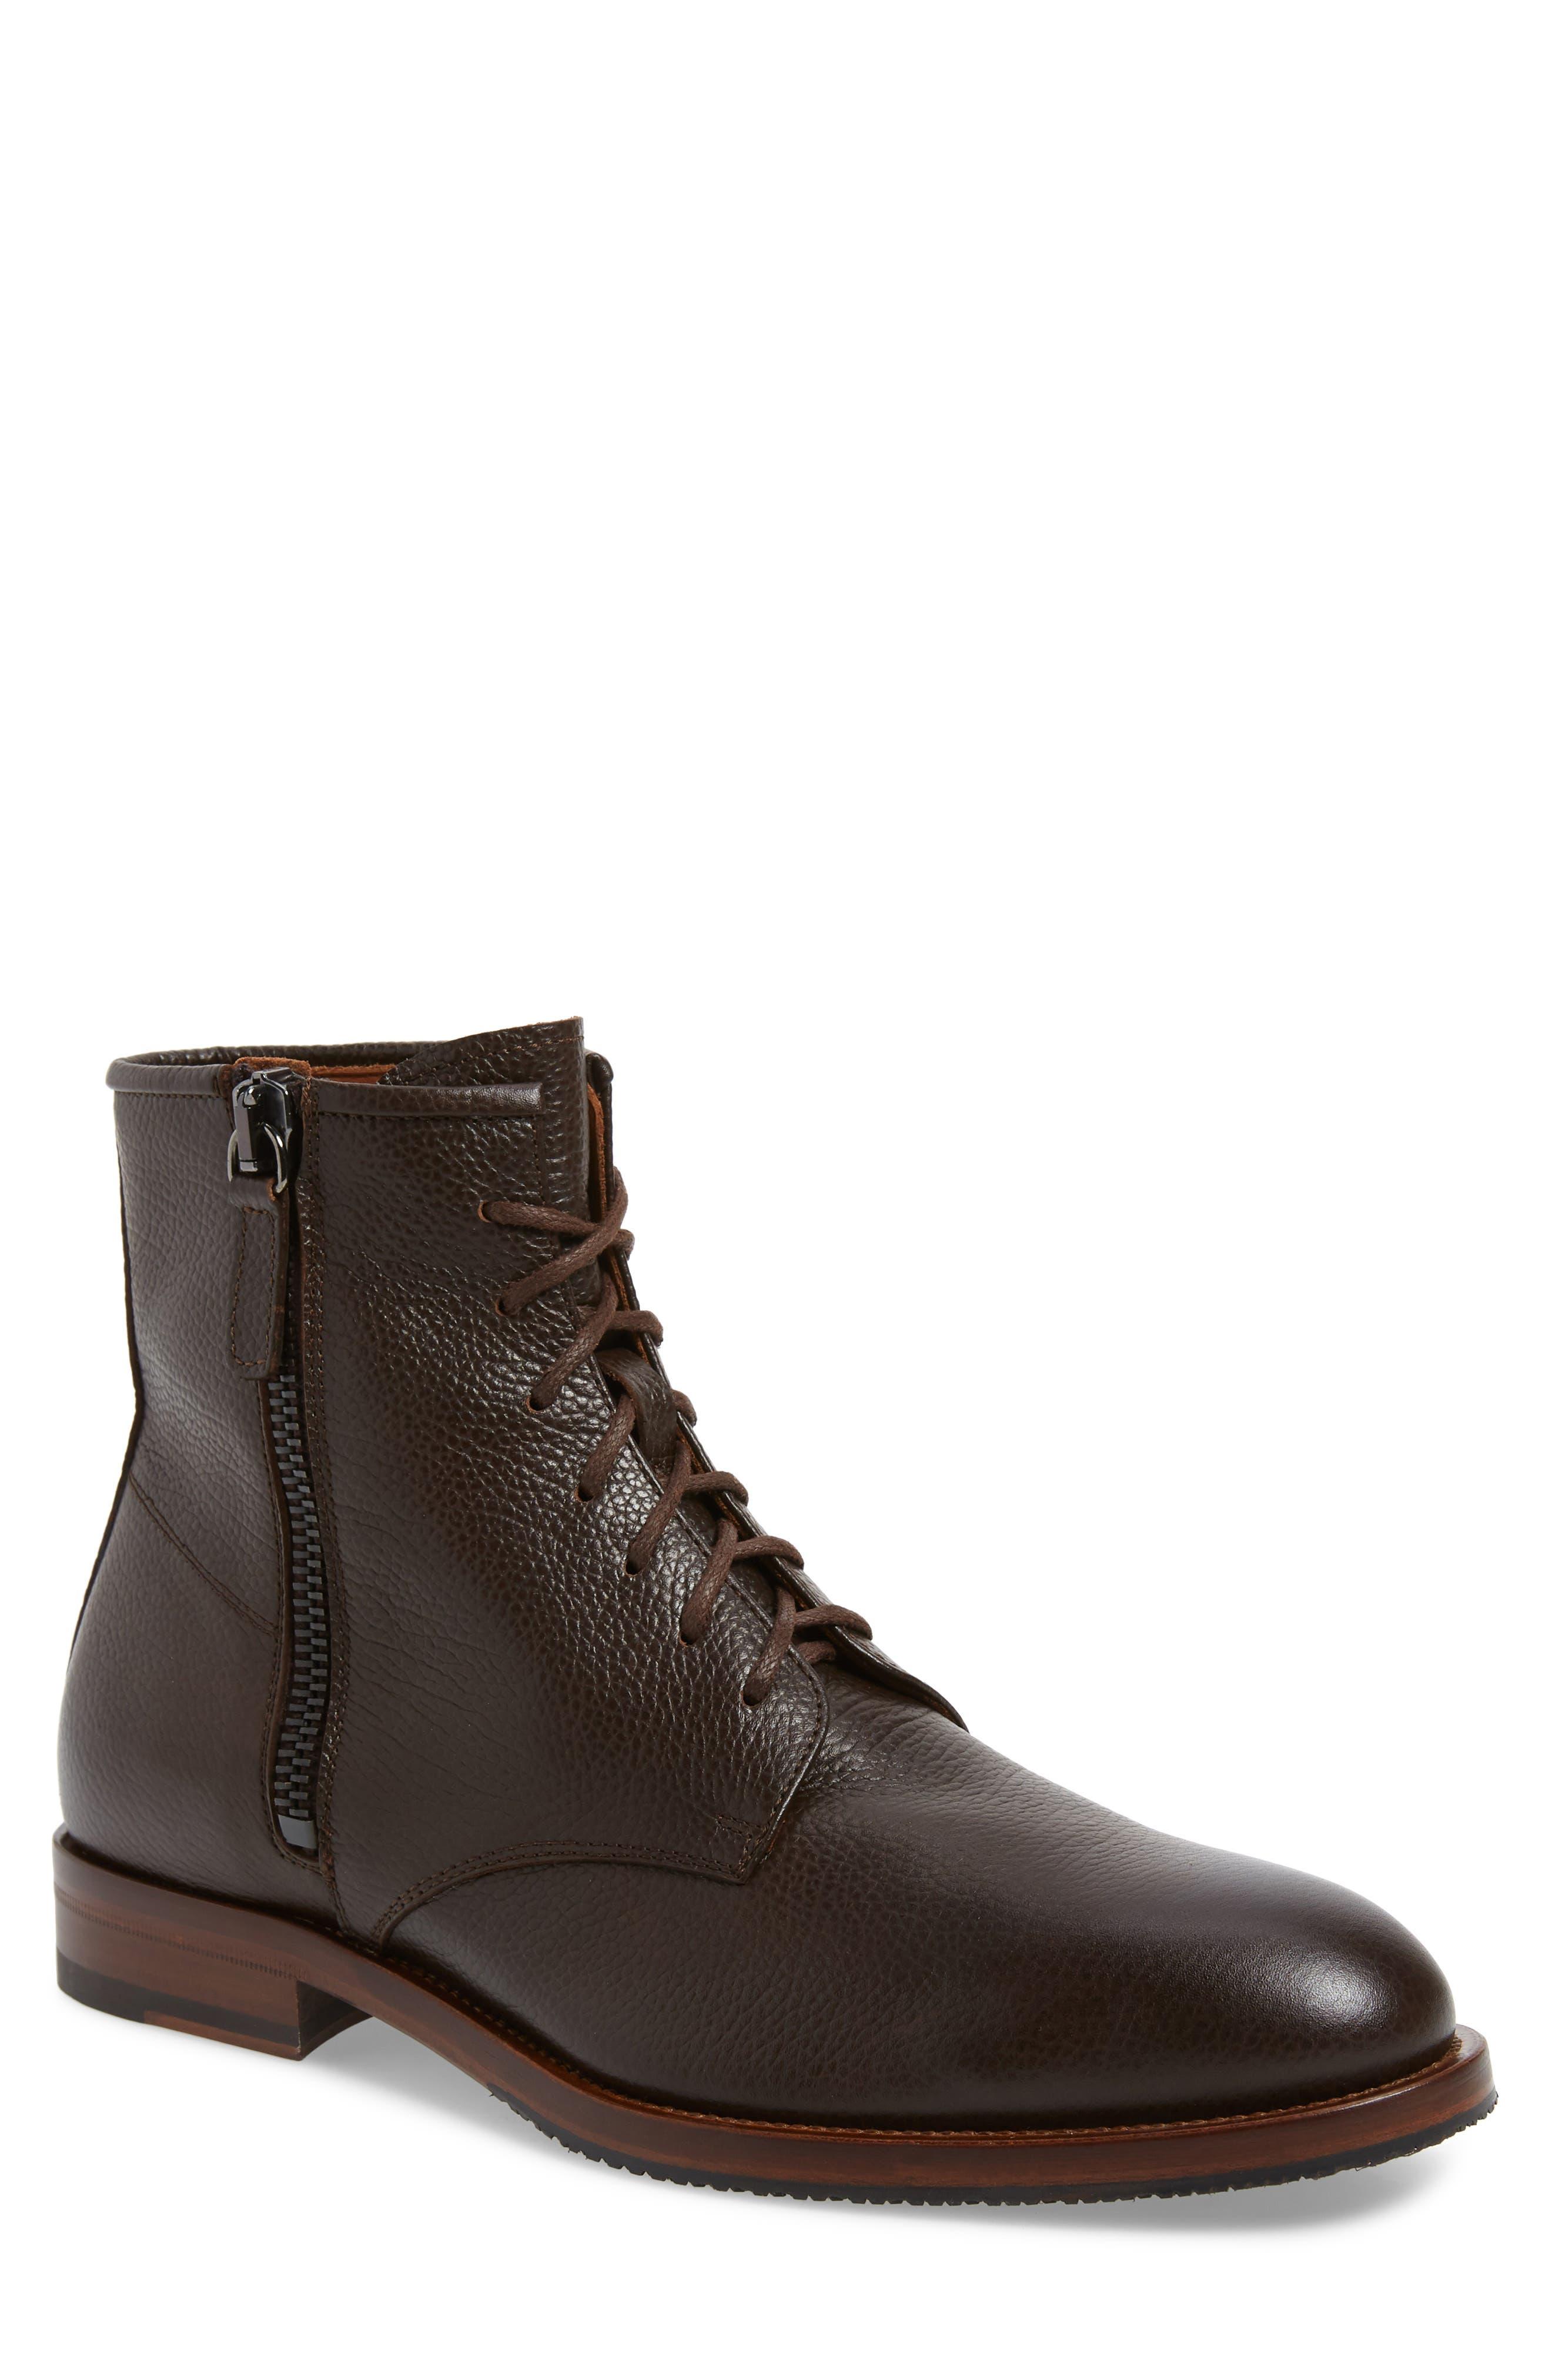 Aquatalia Vladimir Weatherproof Boot, Brown